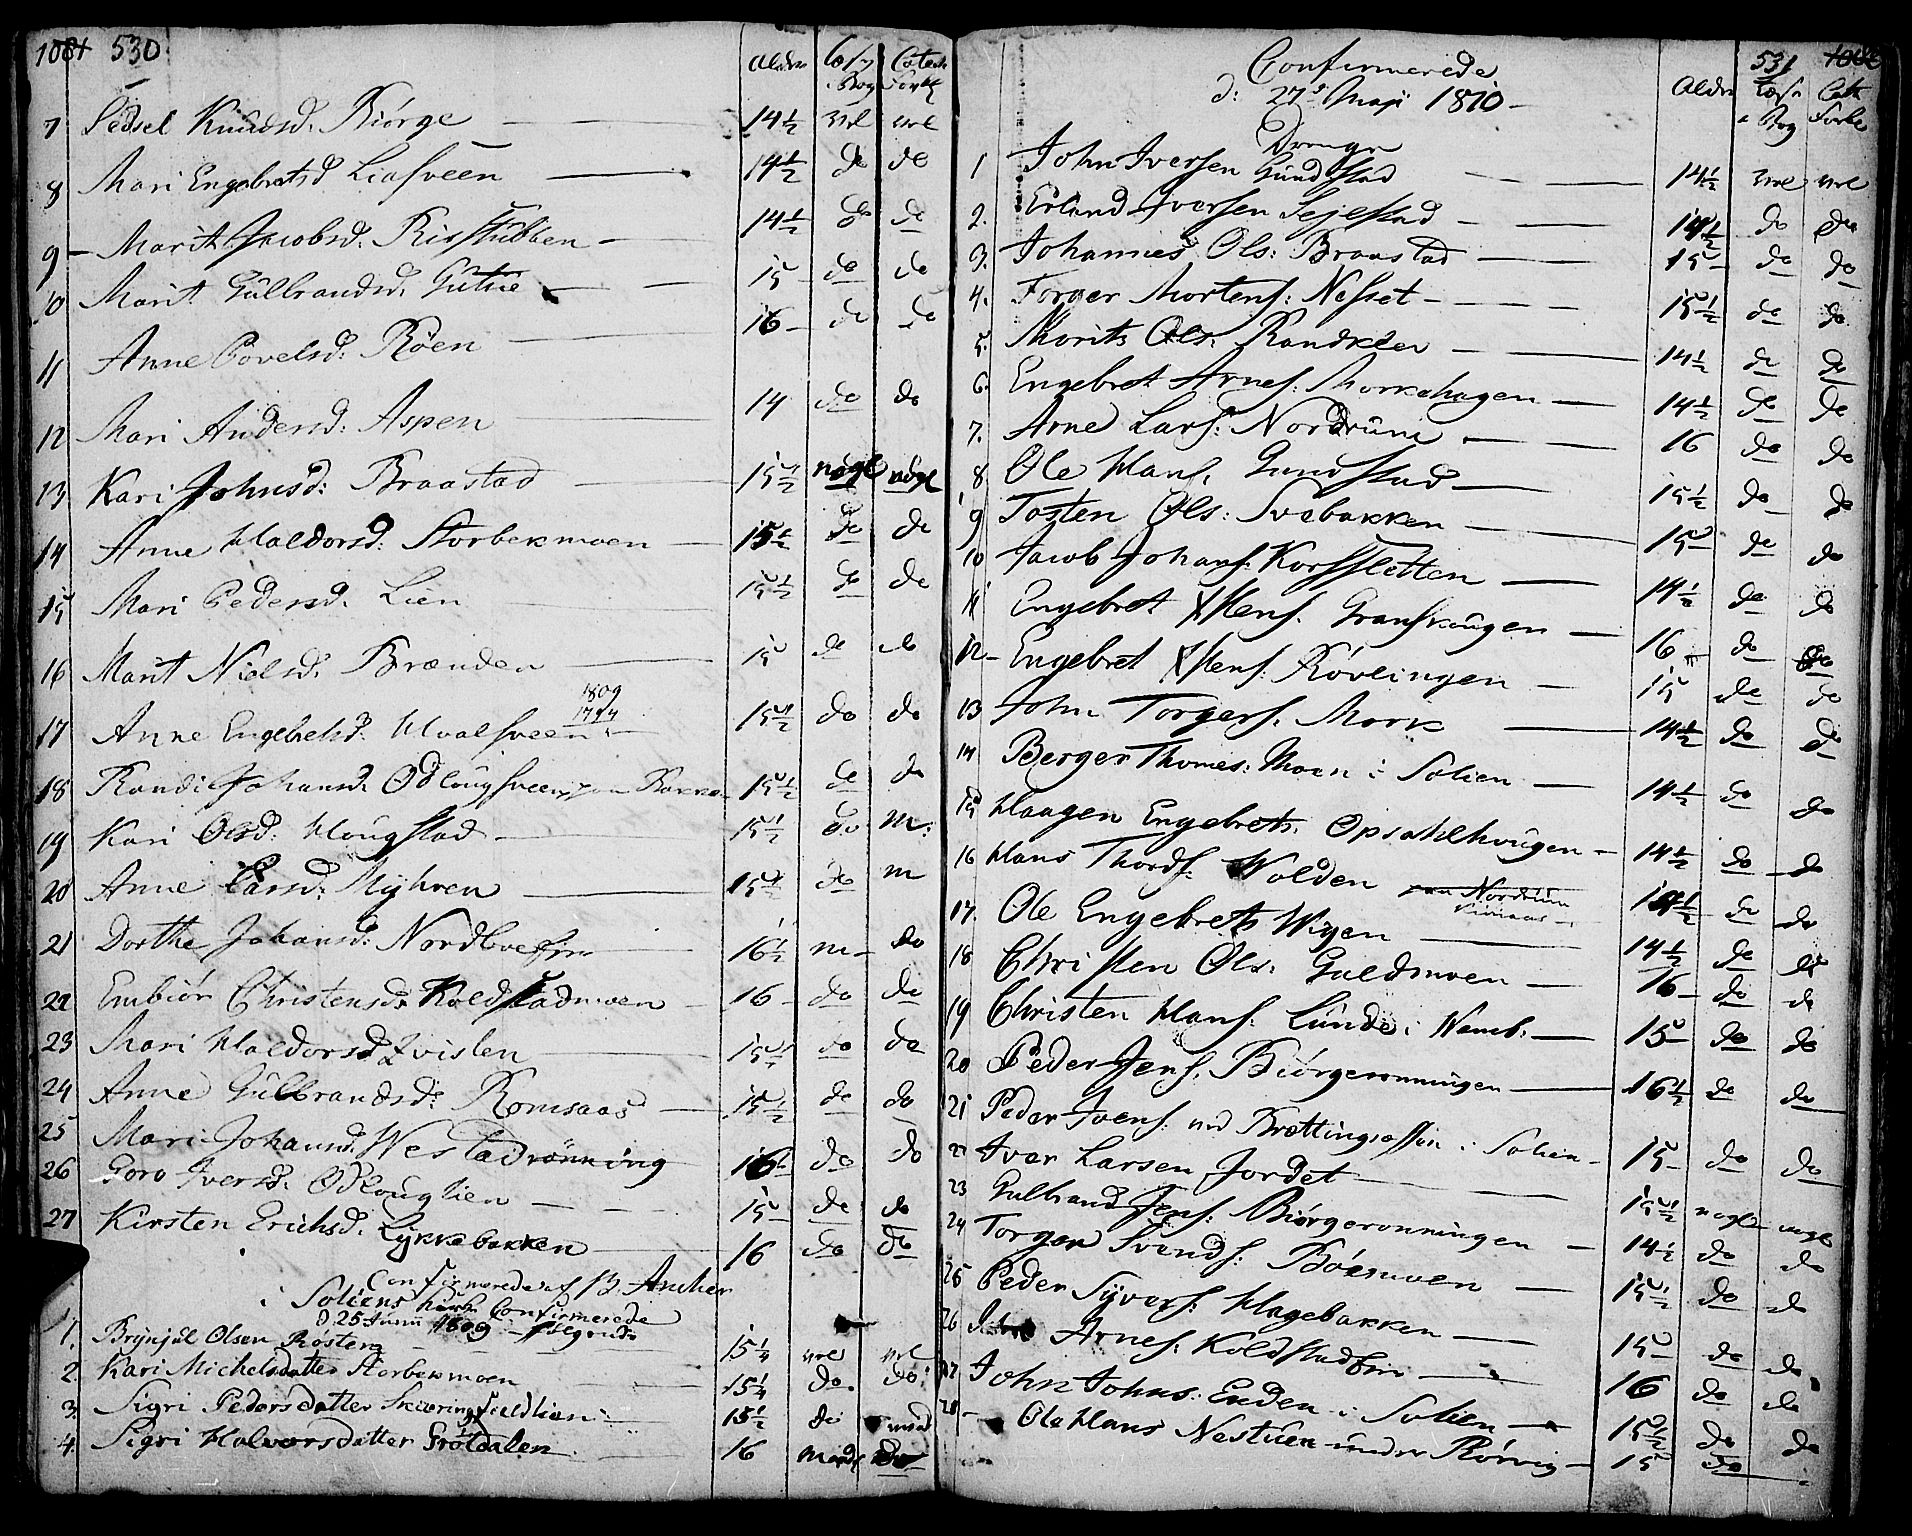 SAH, Ringebu prestekontor, Ministerialbok nr. 3, 1781-1820, s. 530-531